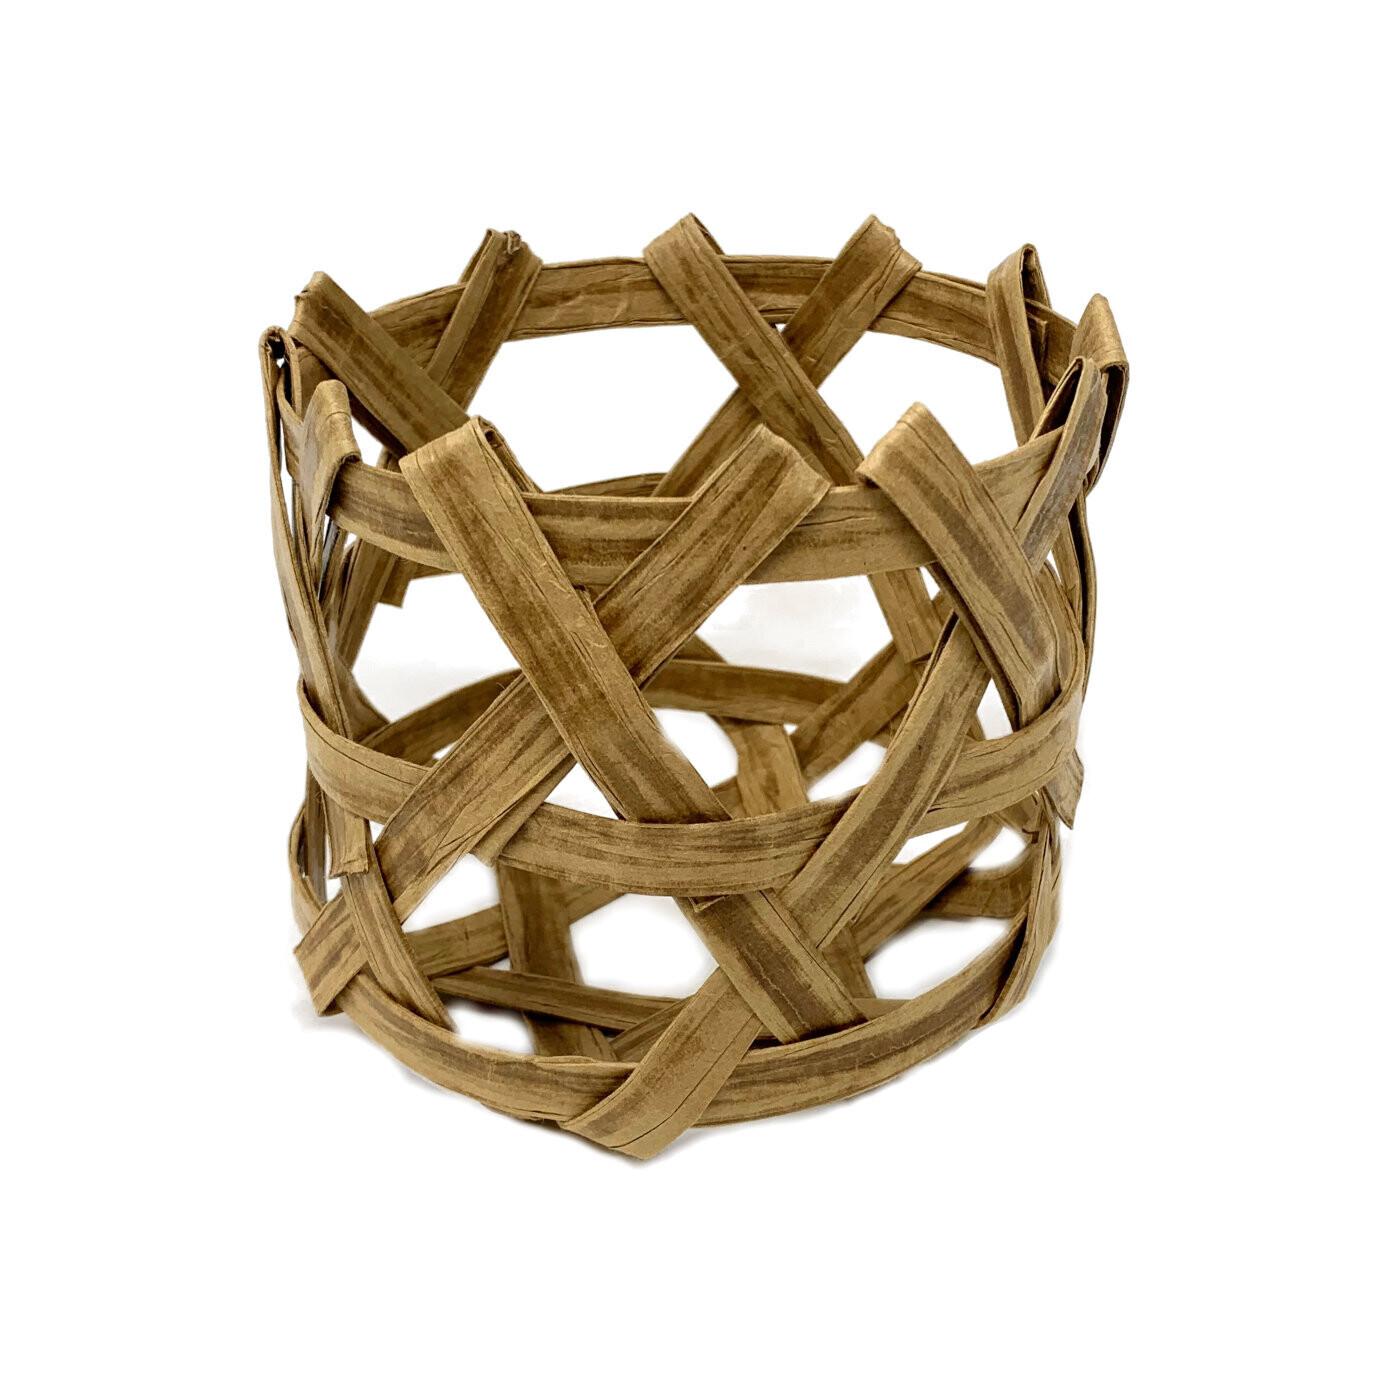 Plaited Basket Kit - Hexagonal Style